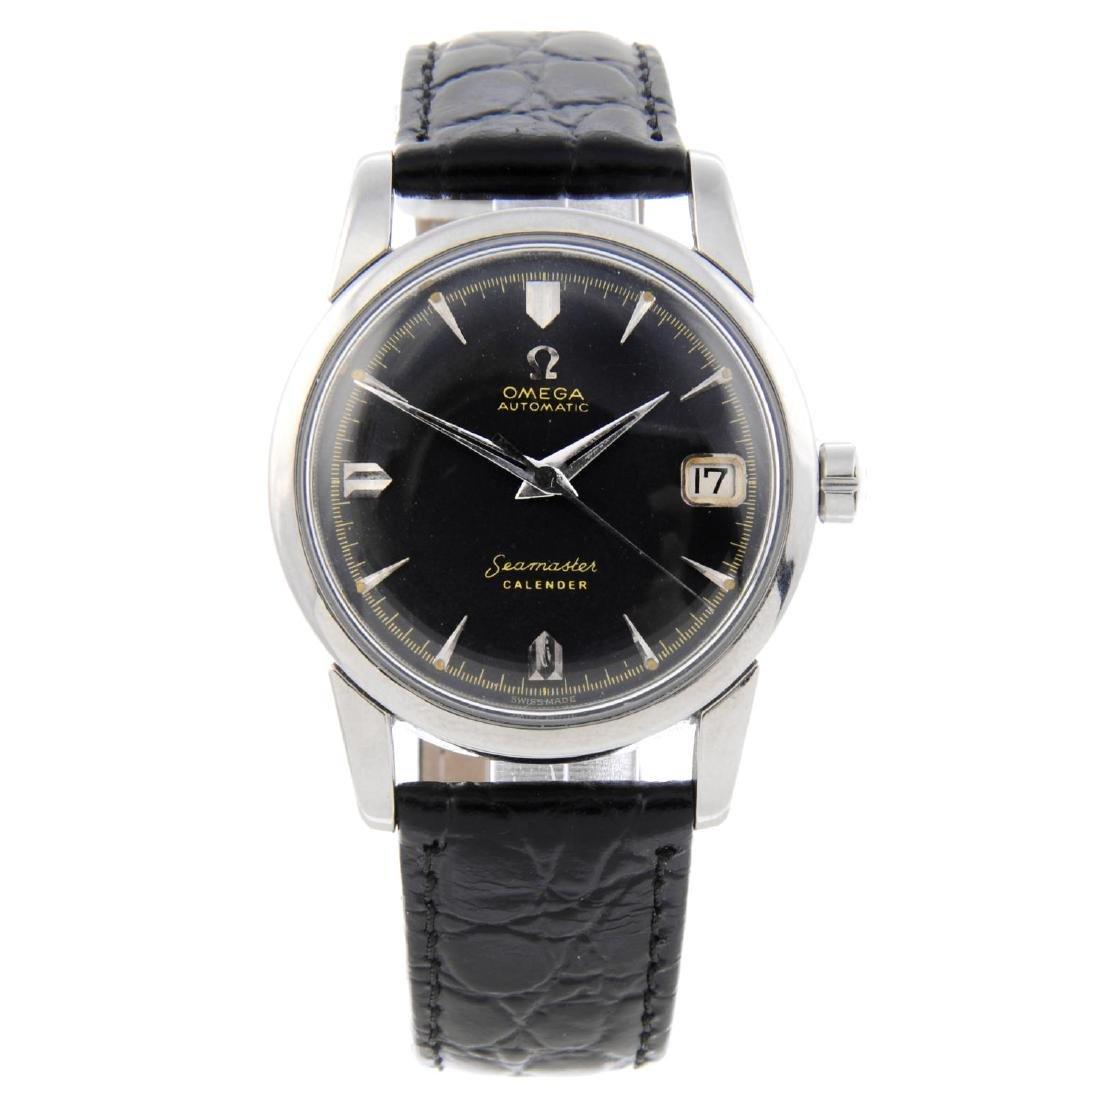 OMEGA - a gentleman's Seamaster Calender wrist watch.